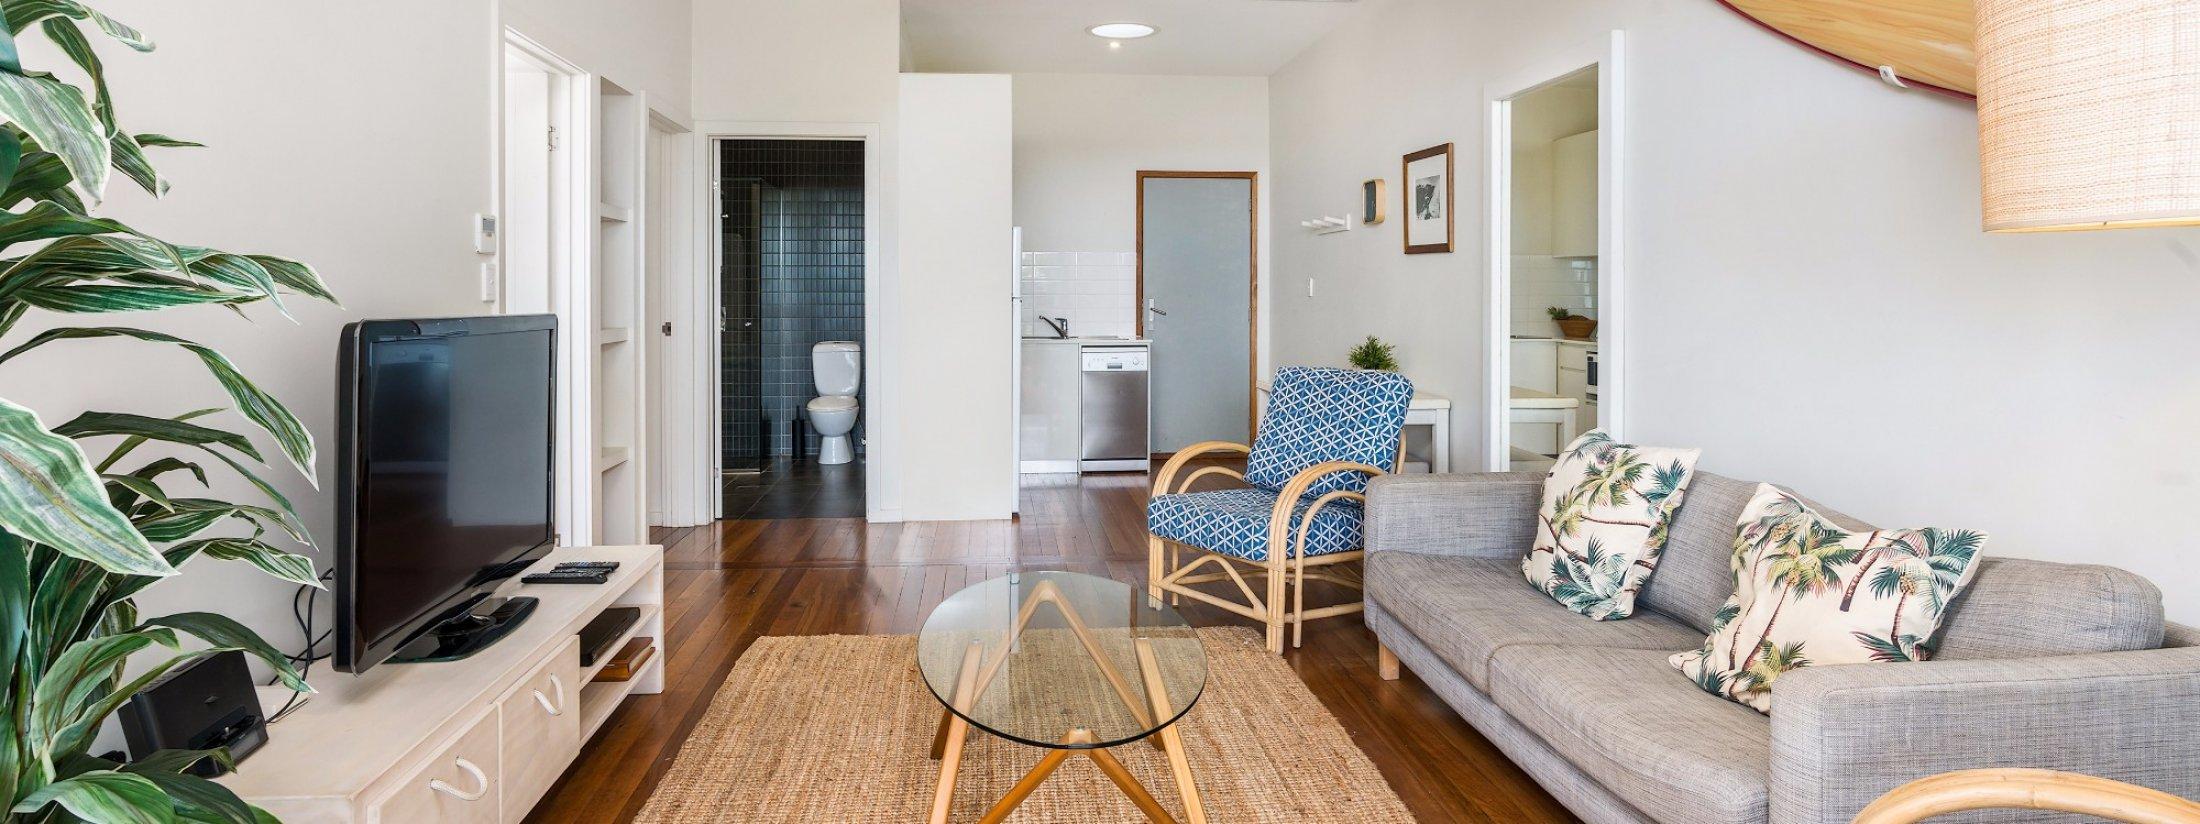 Quiksilver Apartments - The Pass - apartment